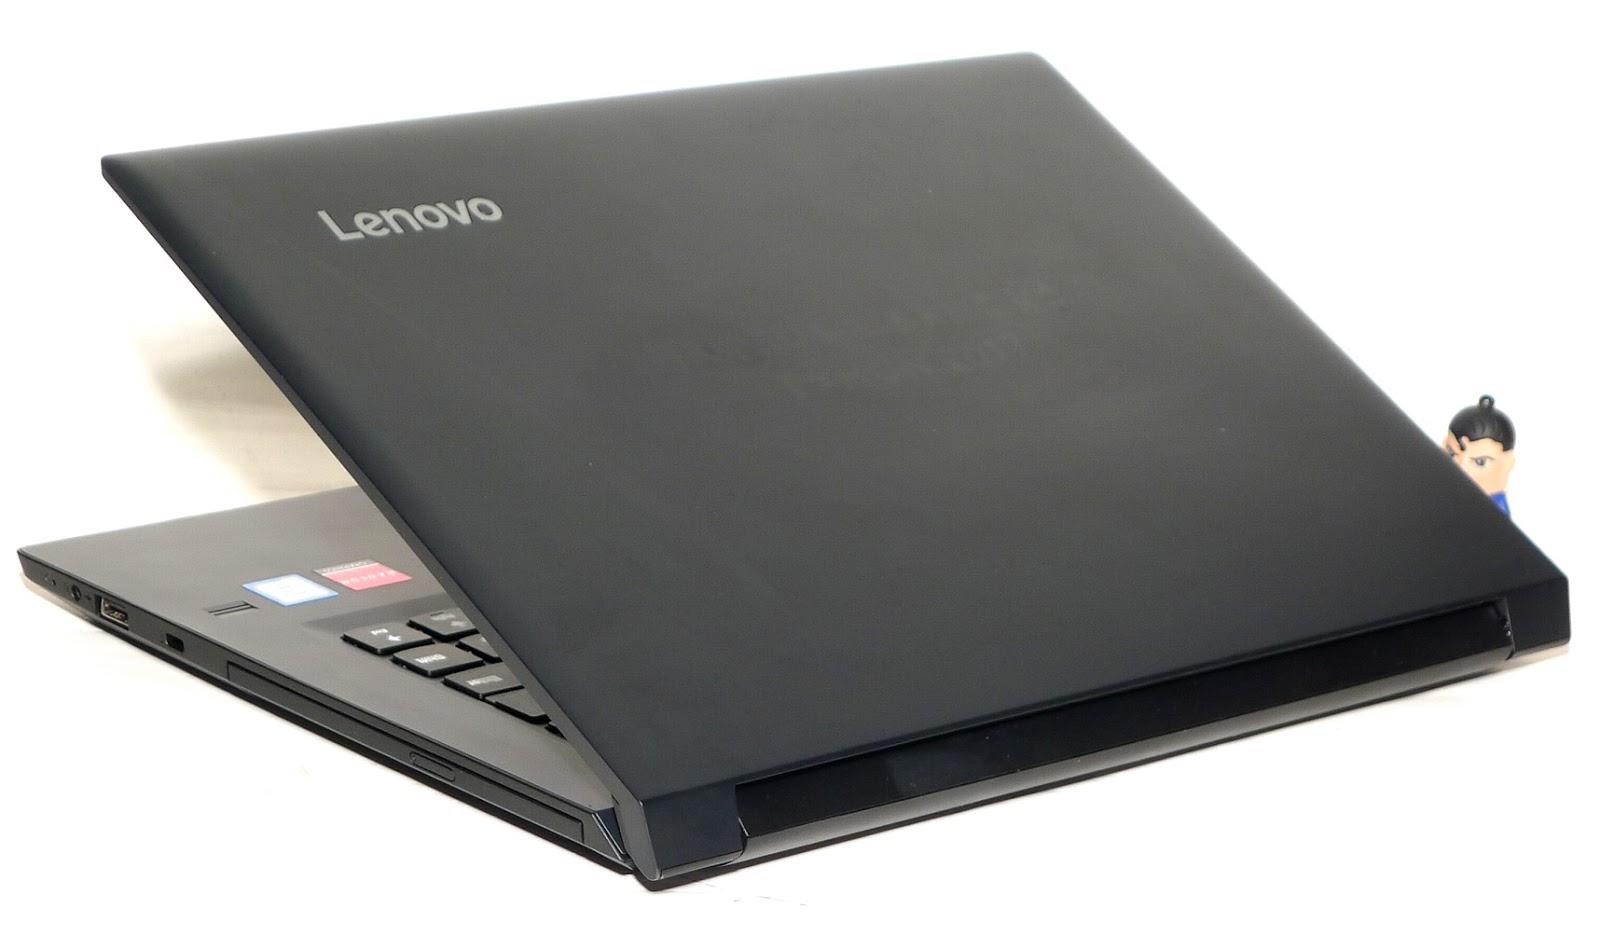 Laptop Gaming Lenovo V310 Core I7 Gen7 Double Vga Jual Beli Laptop Bekas Kamera Service Sparepart Di Malang